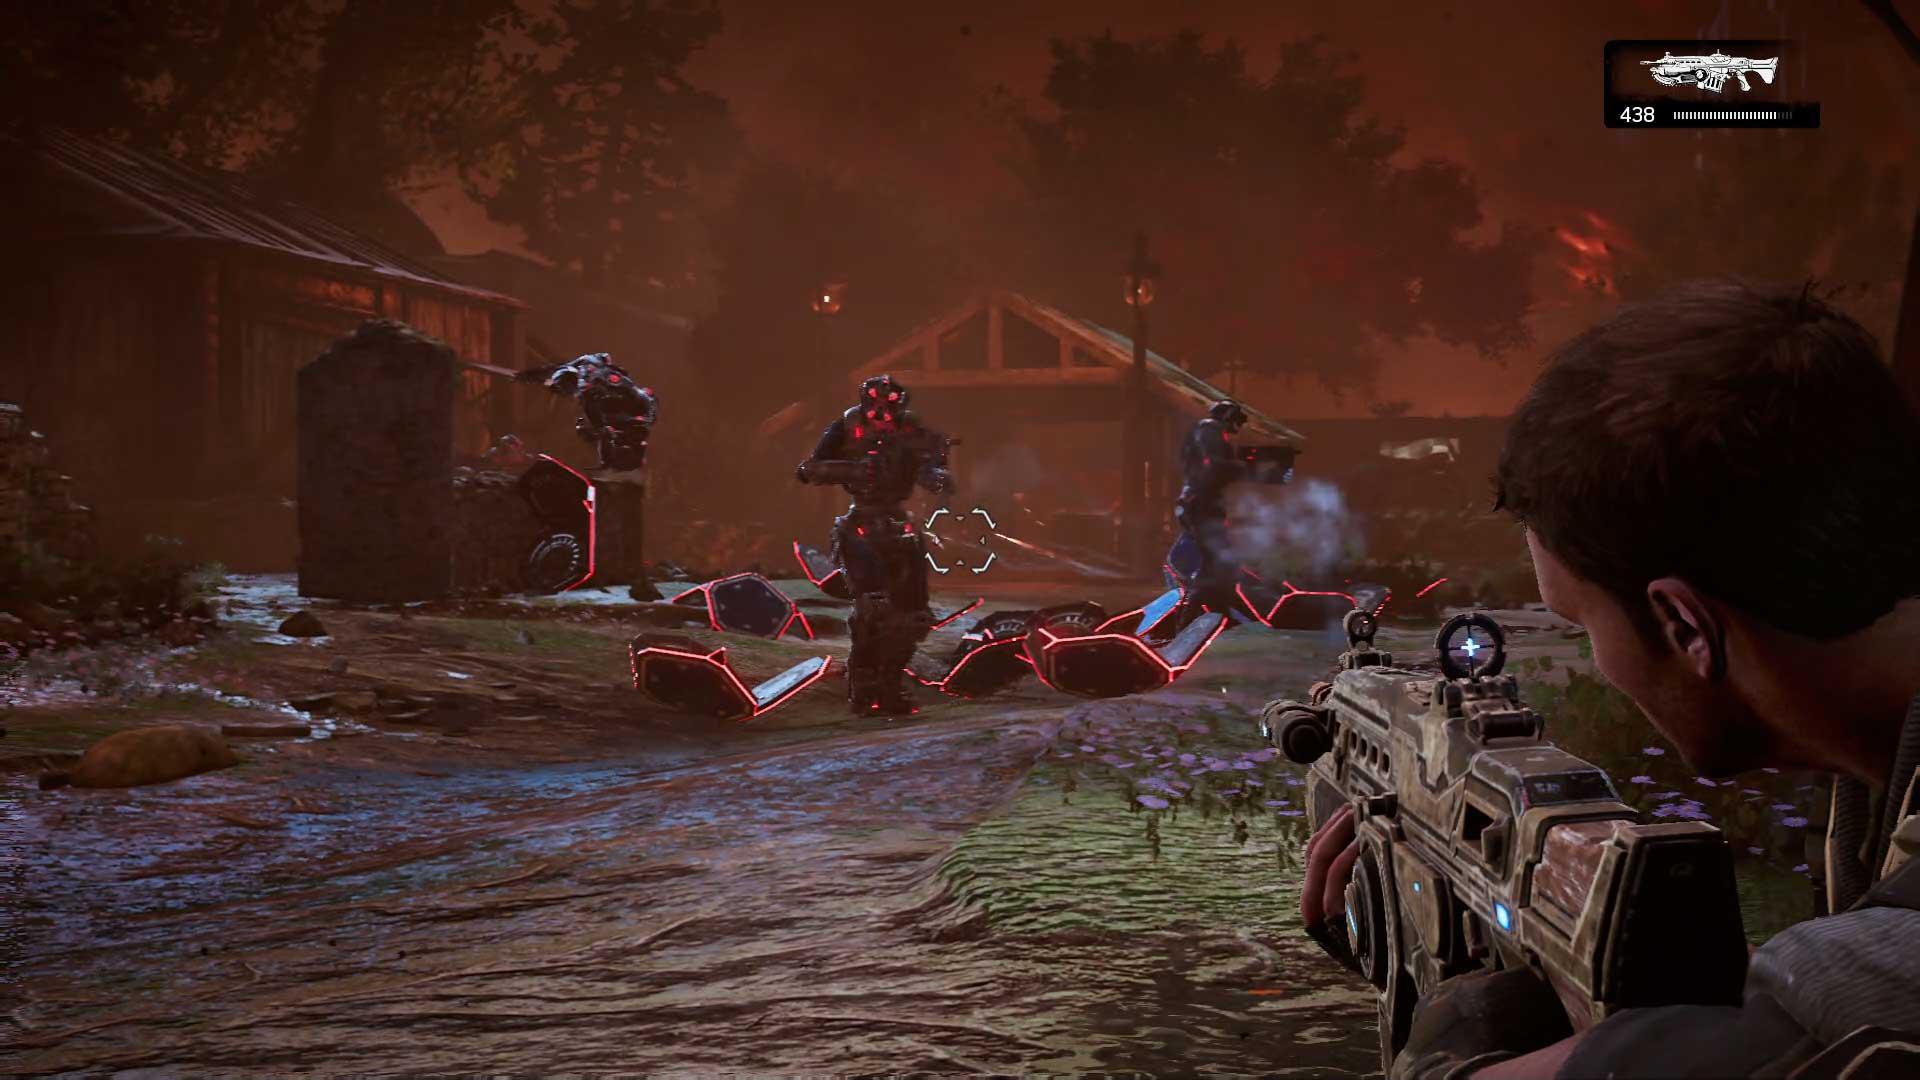 Análisis Gears of War 4 DeeBees